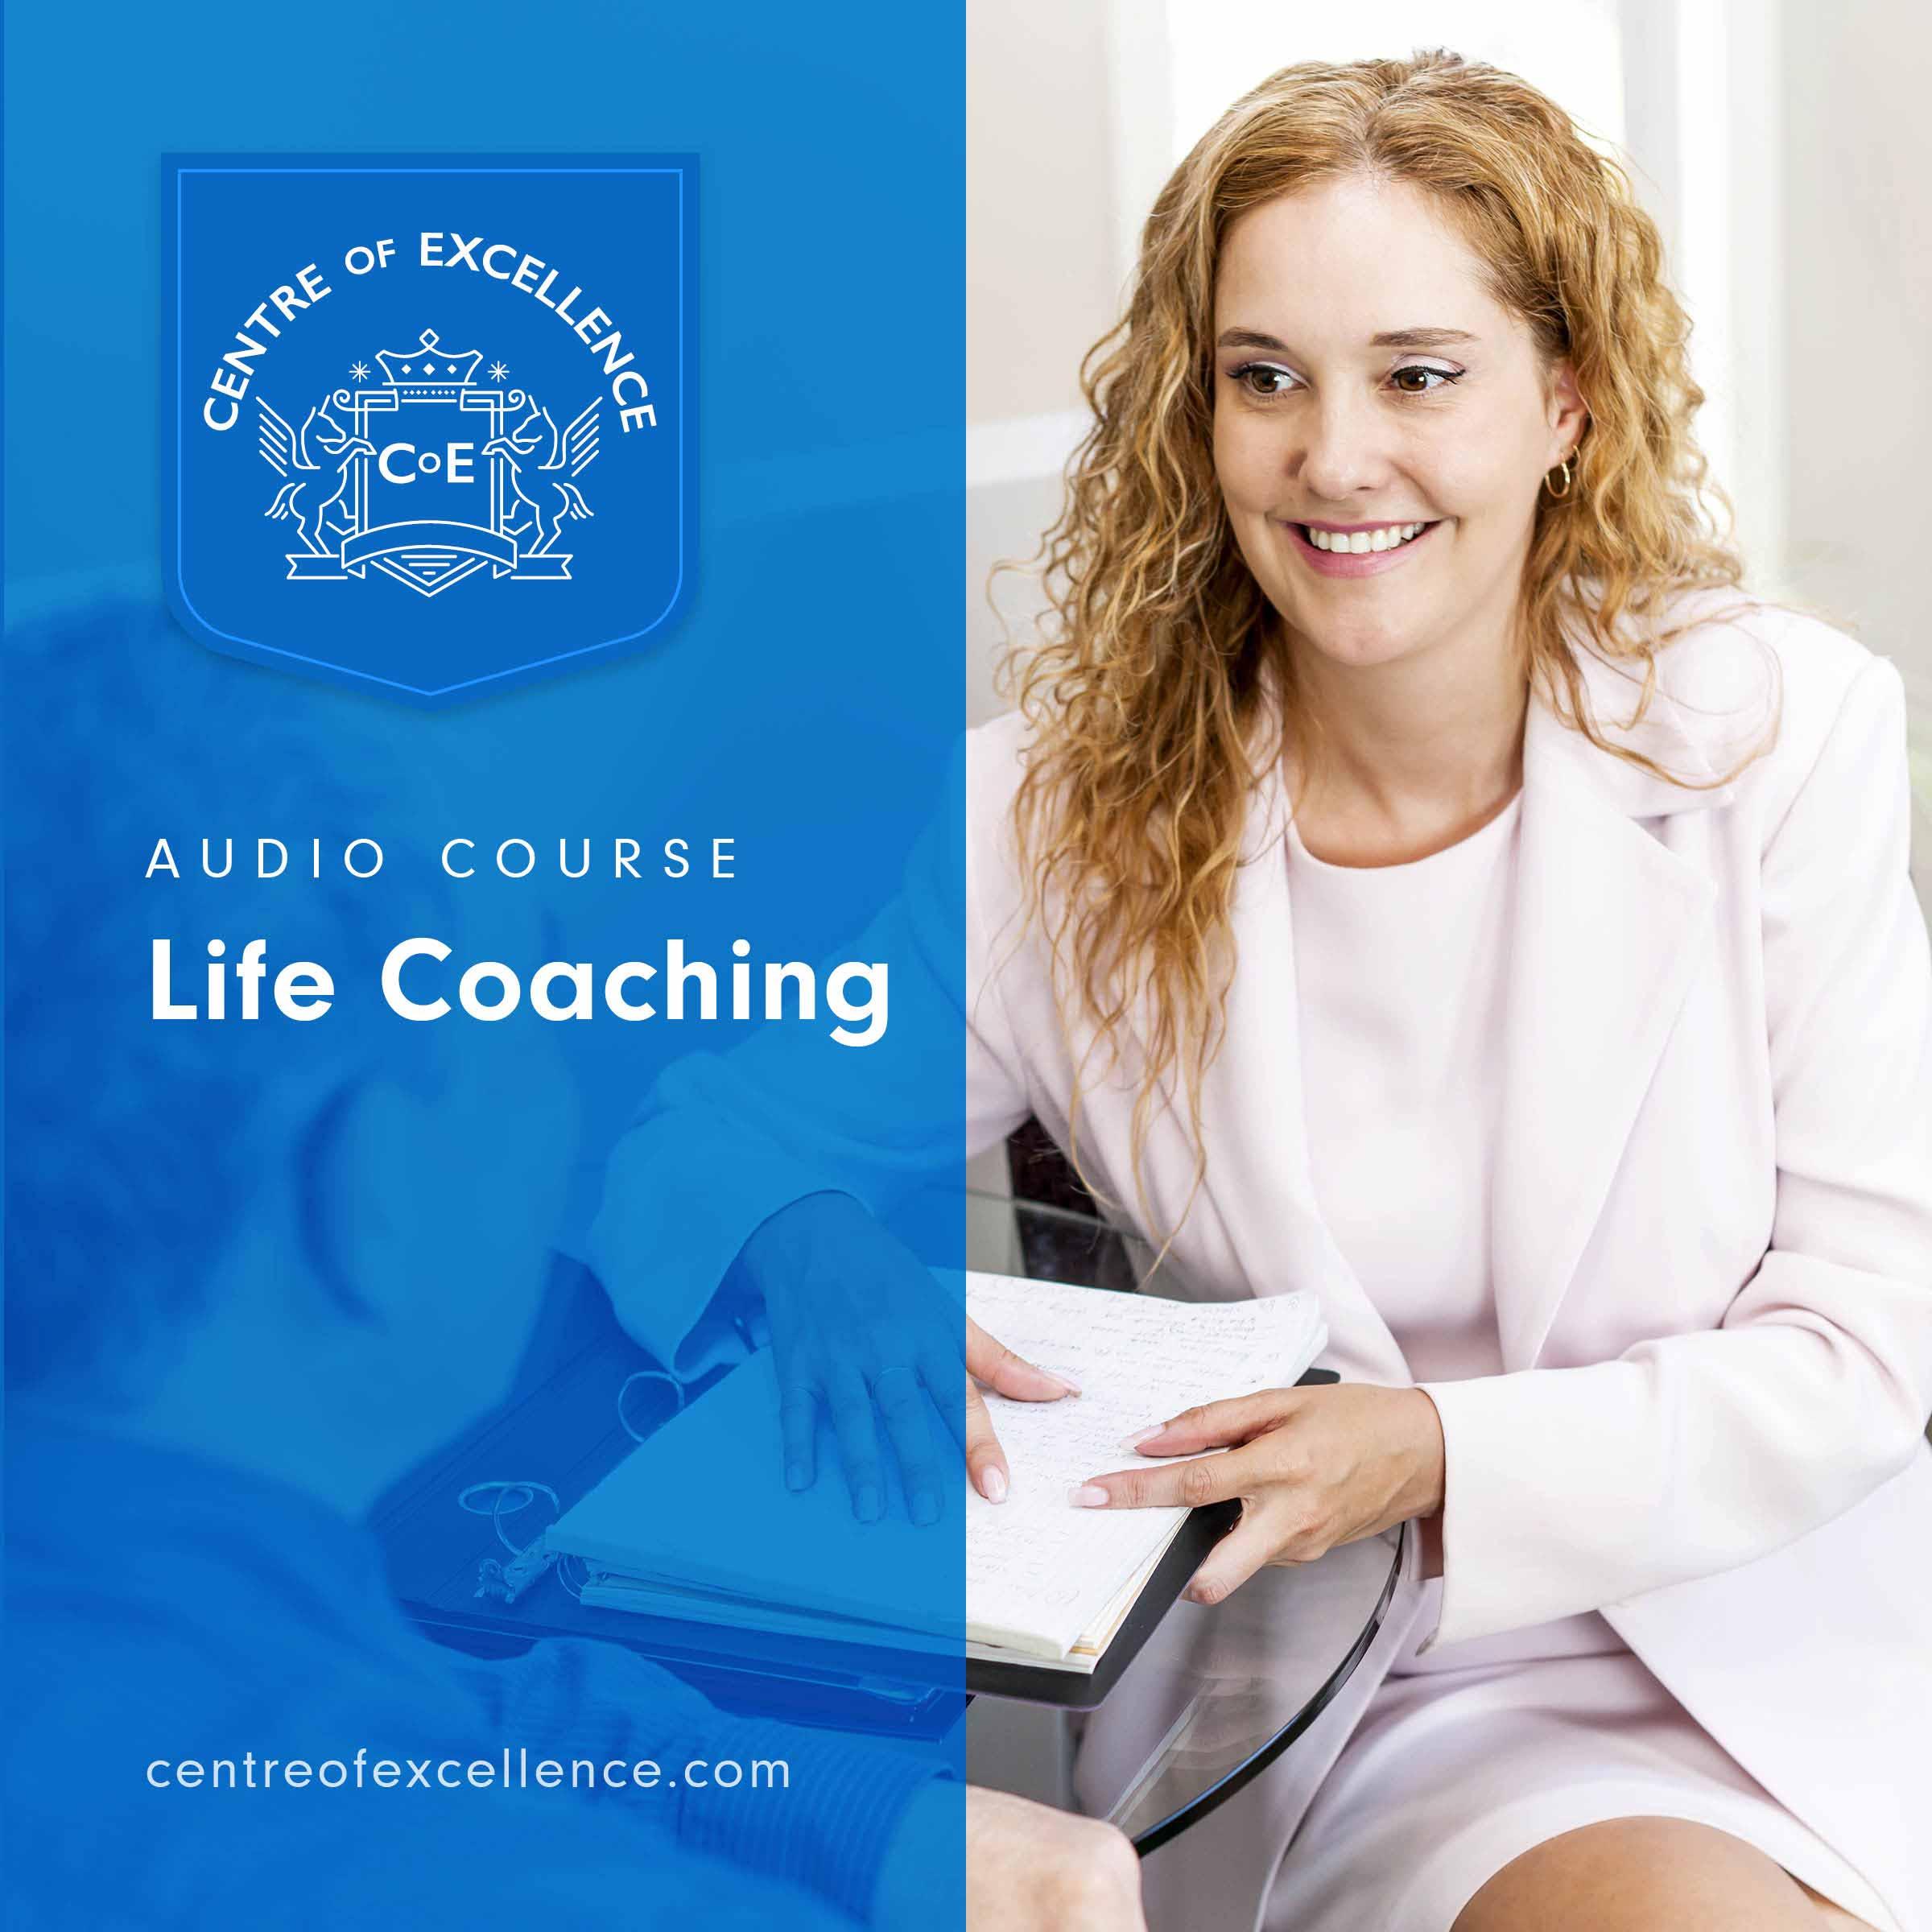 Life Coaching Audio Course